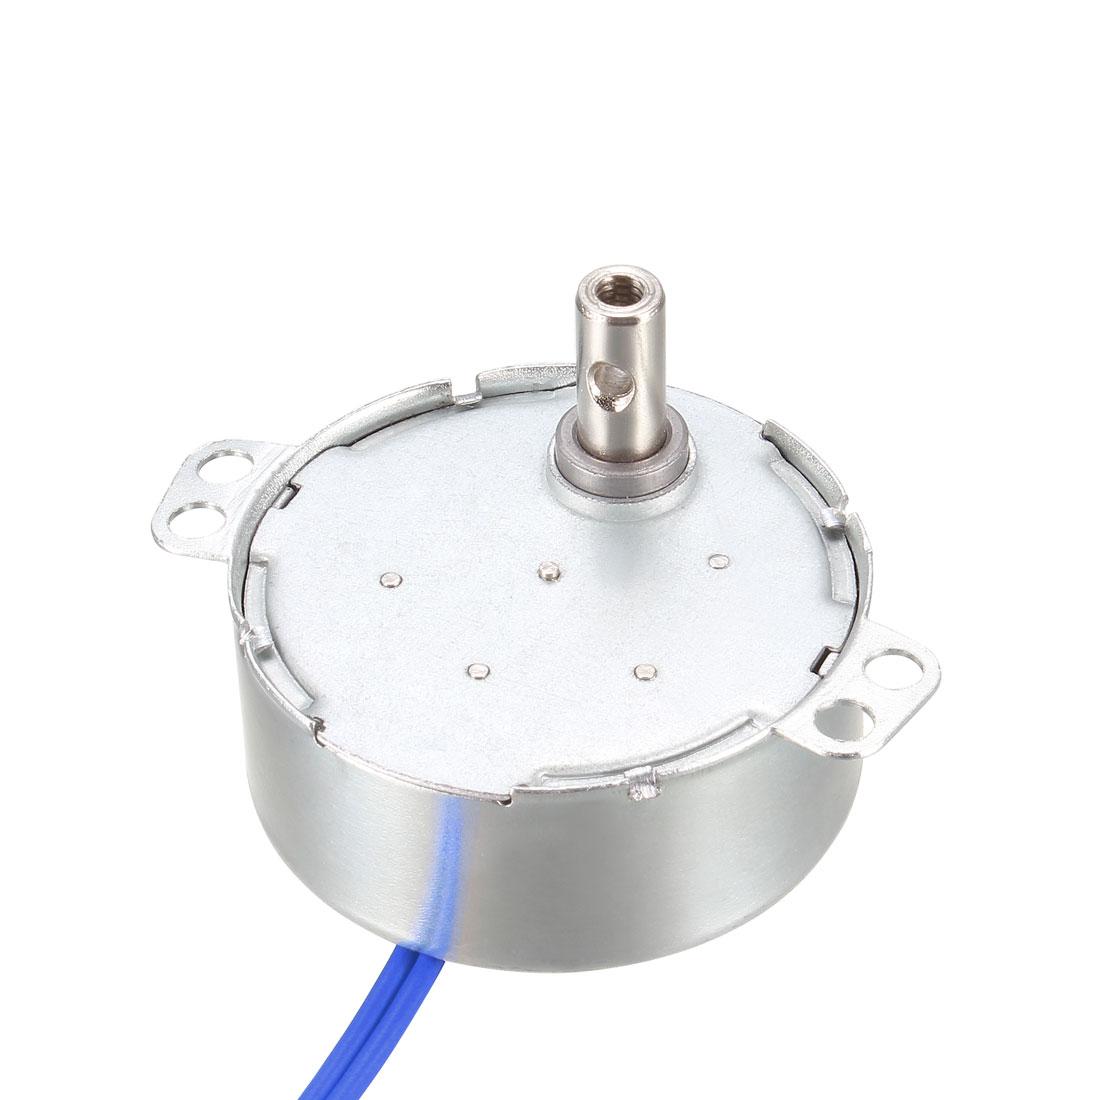 Electric Synchronous Synchron Motor Motor 100-127 VAC 50-60Hz CCW/CW 4W 5-6RPM